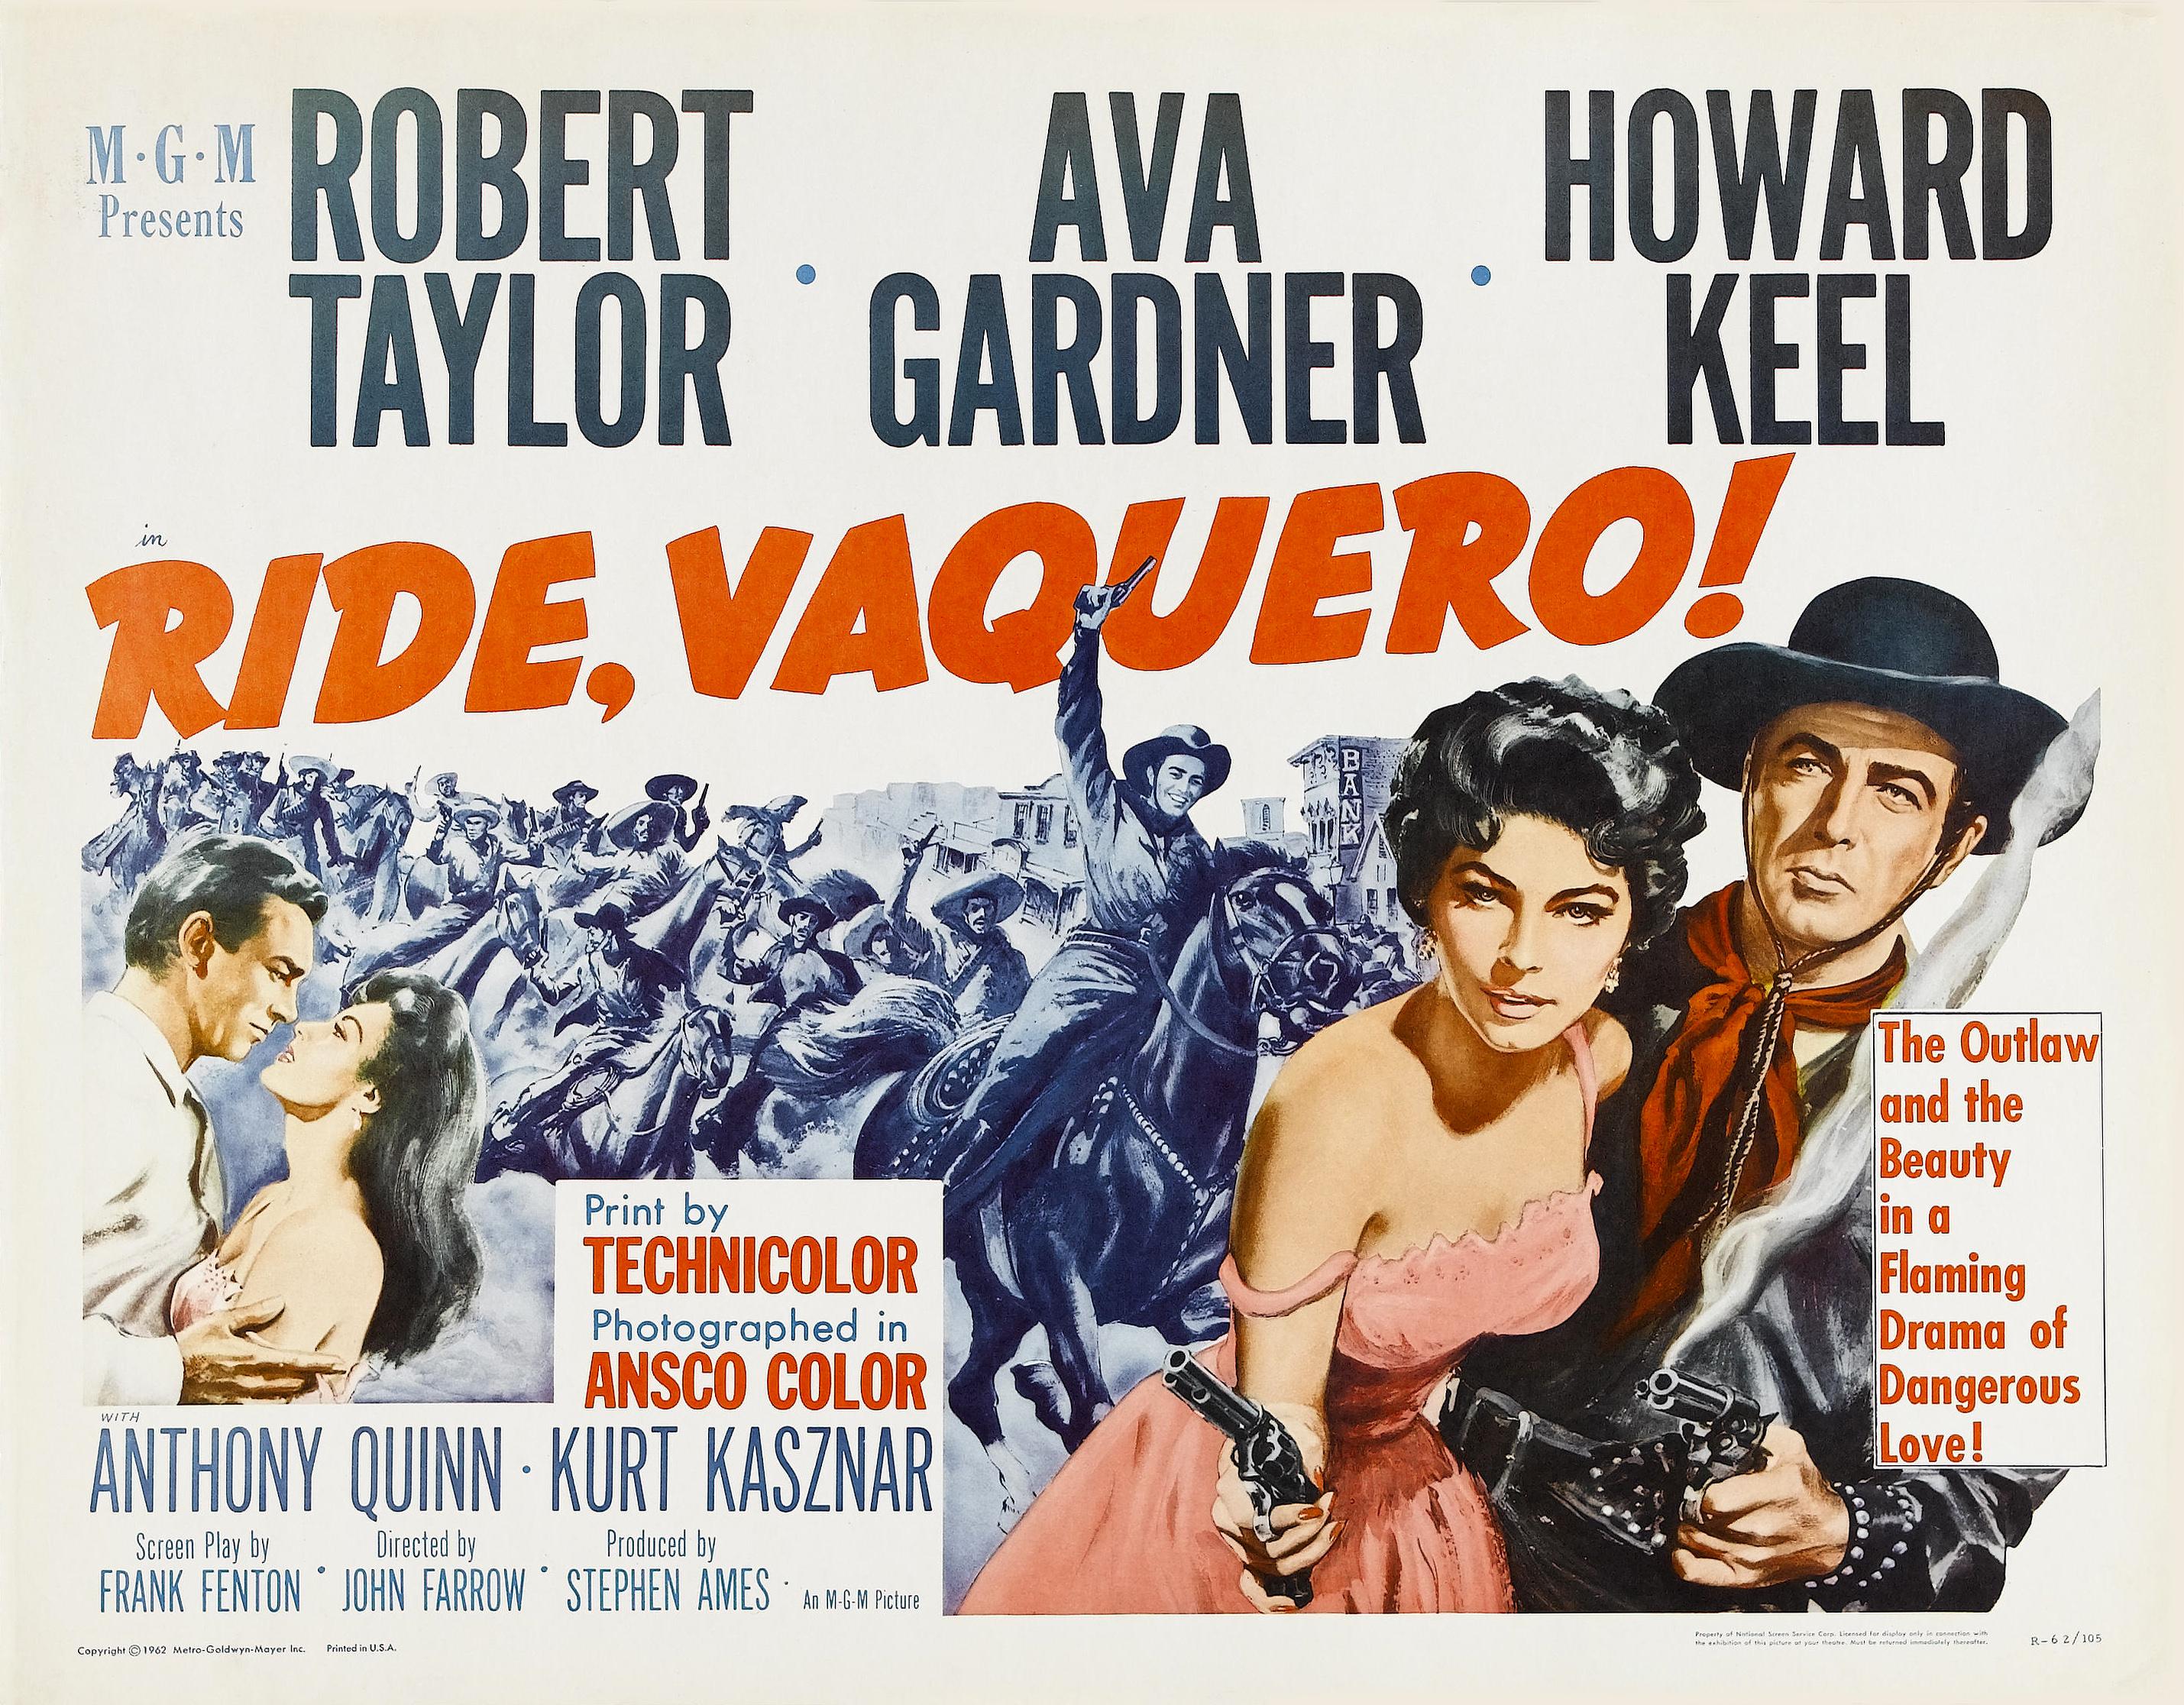 Ava Gardner, Robert Taylor, and Howard Keel in Ride, Vaquero! (1953)